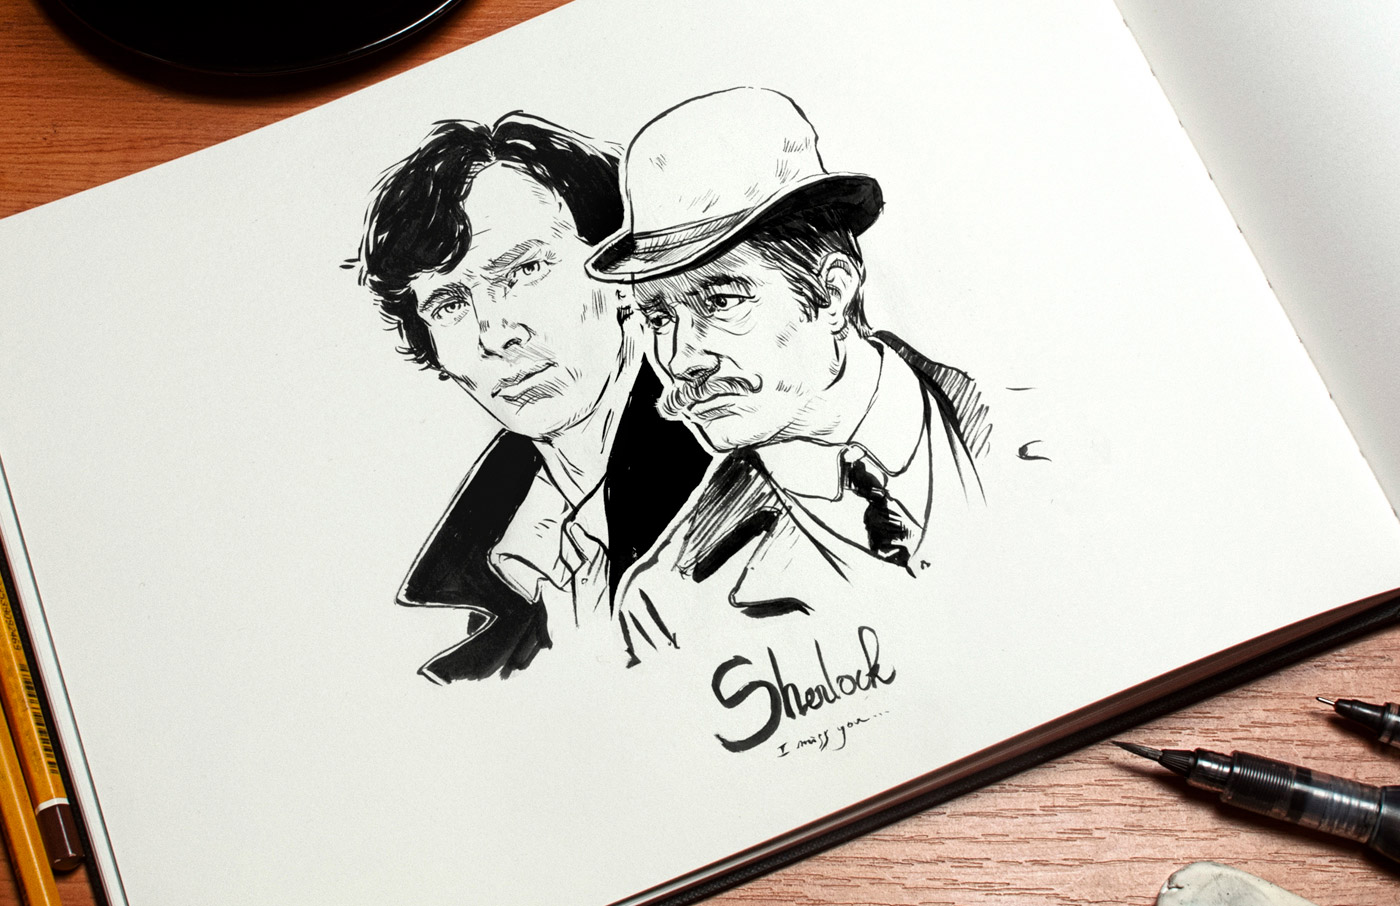 Kuikui Sherlock